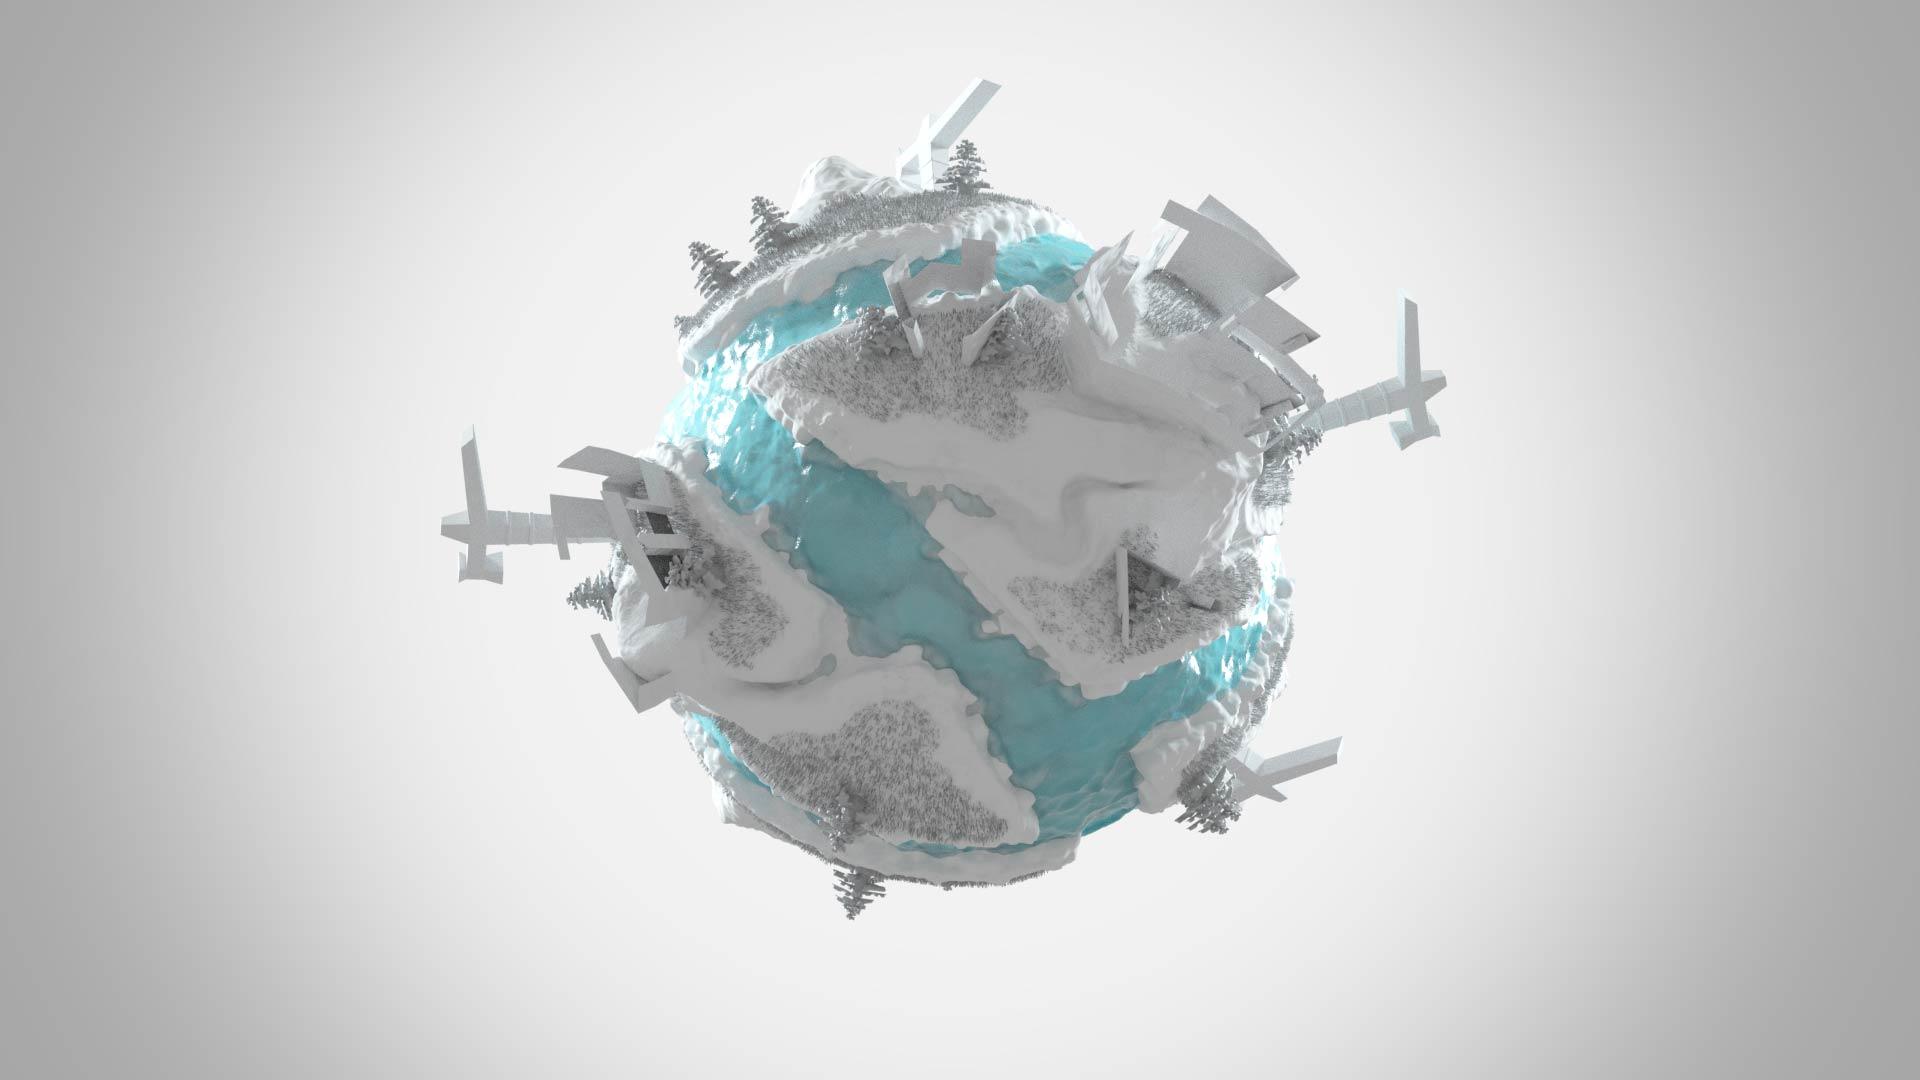 Globe_jungle_transform.jpg